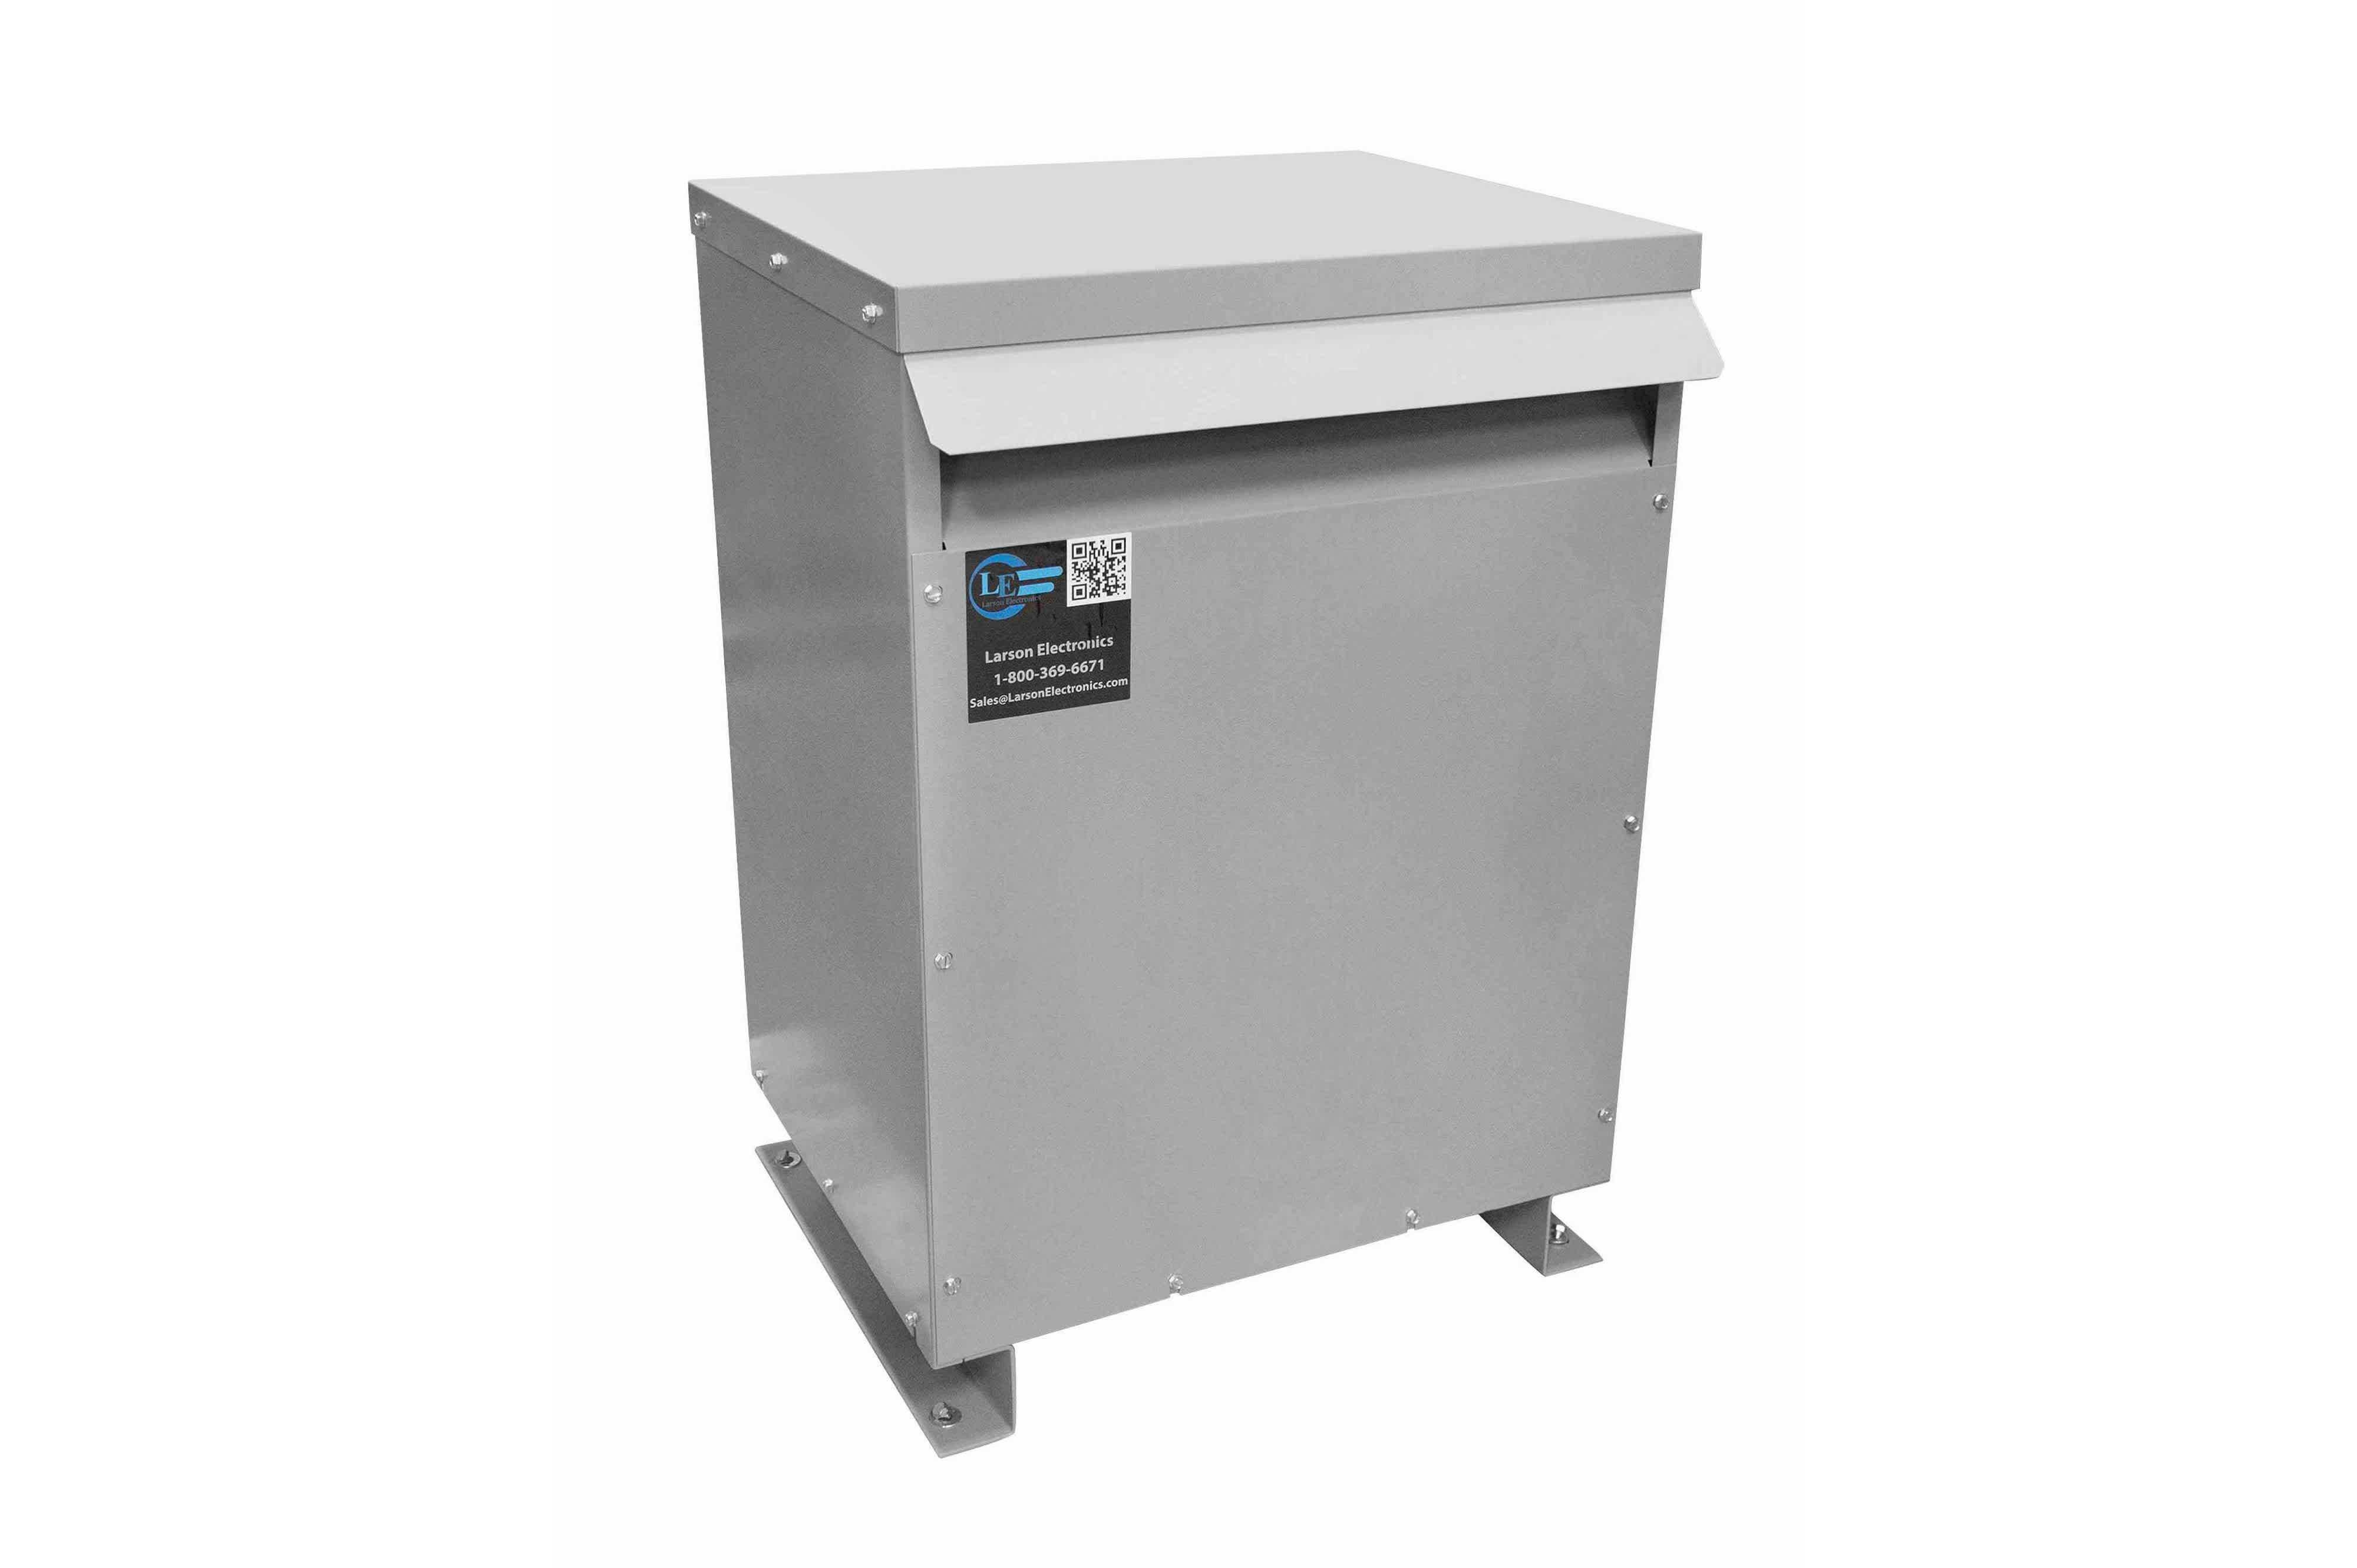 800 kVA 3PH Isolation Transformer, 460V Wye Primary, 575V Delta Secondary, N3R, Ventilated, 60 Hz